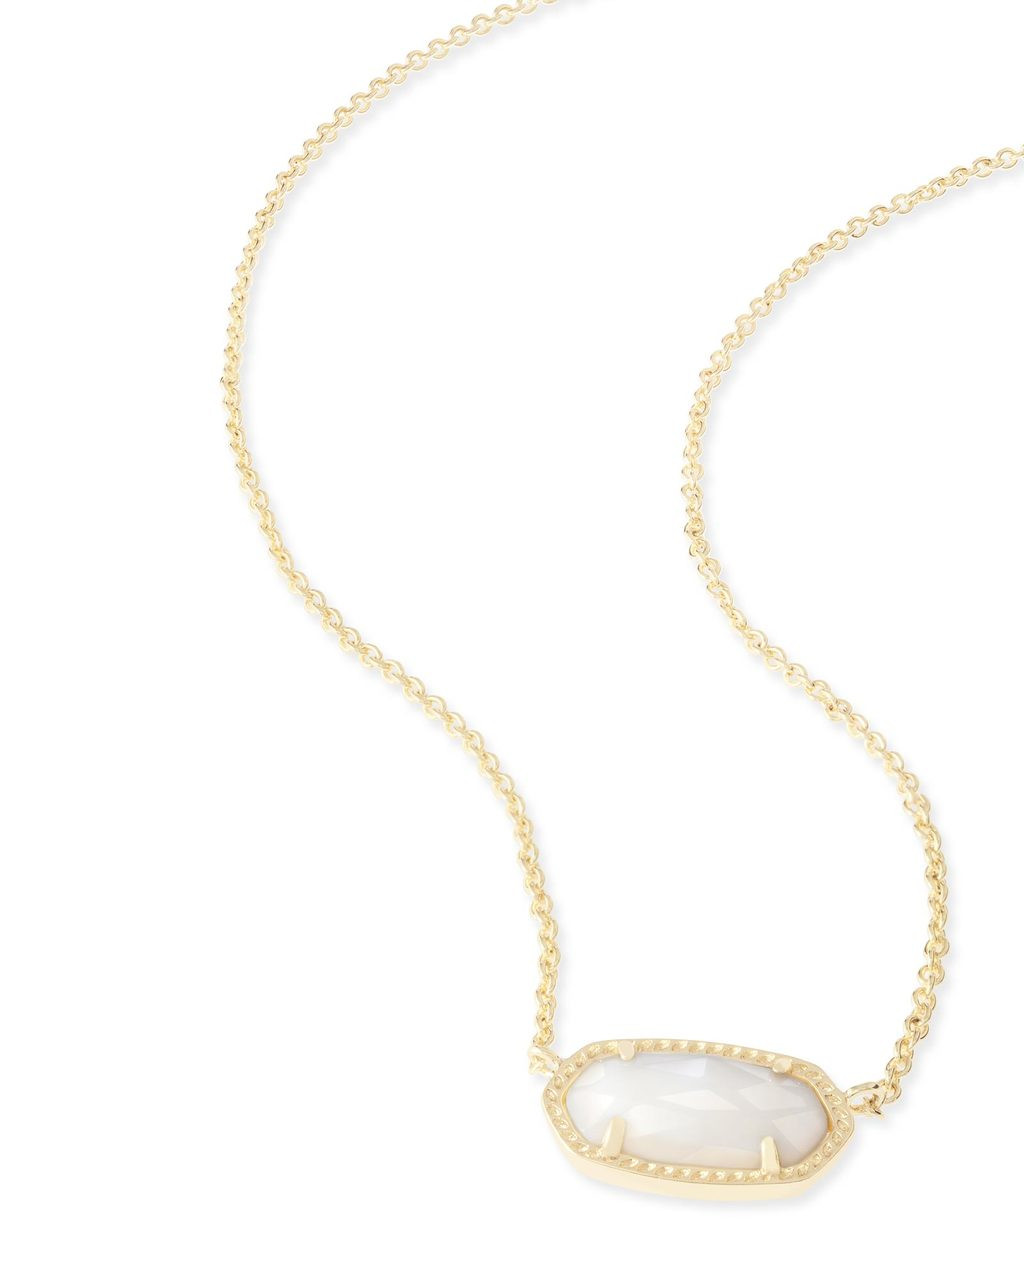 a7c988e5082ce Kendra Scott Elisa Gold Pendant Necklace in White Pearl